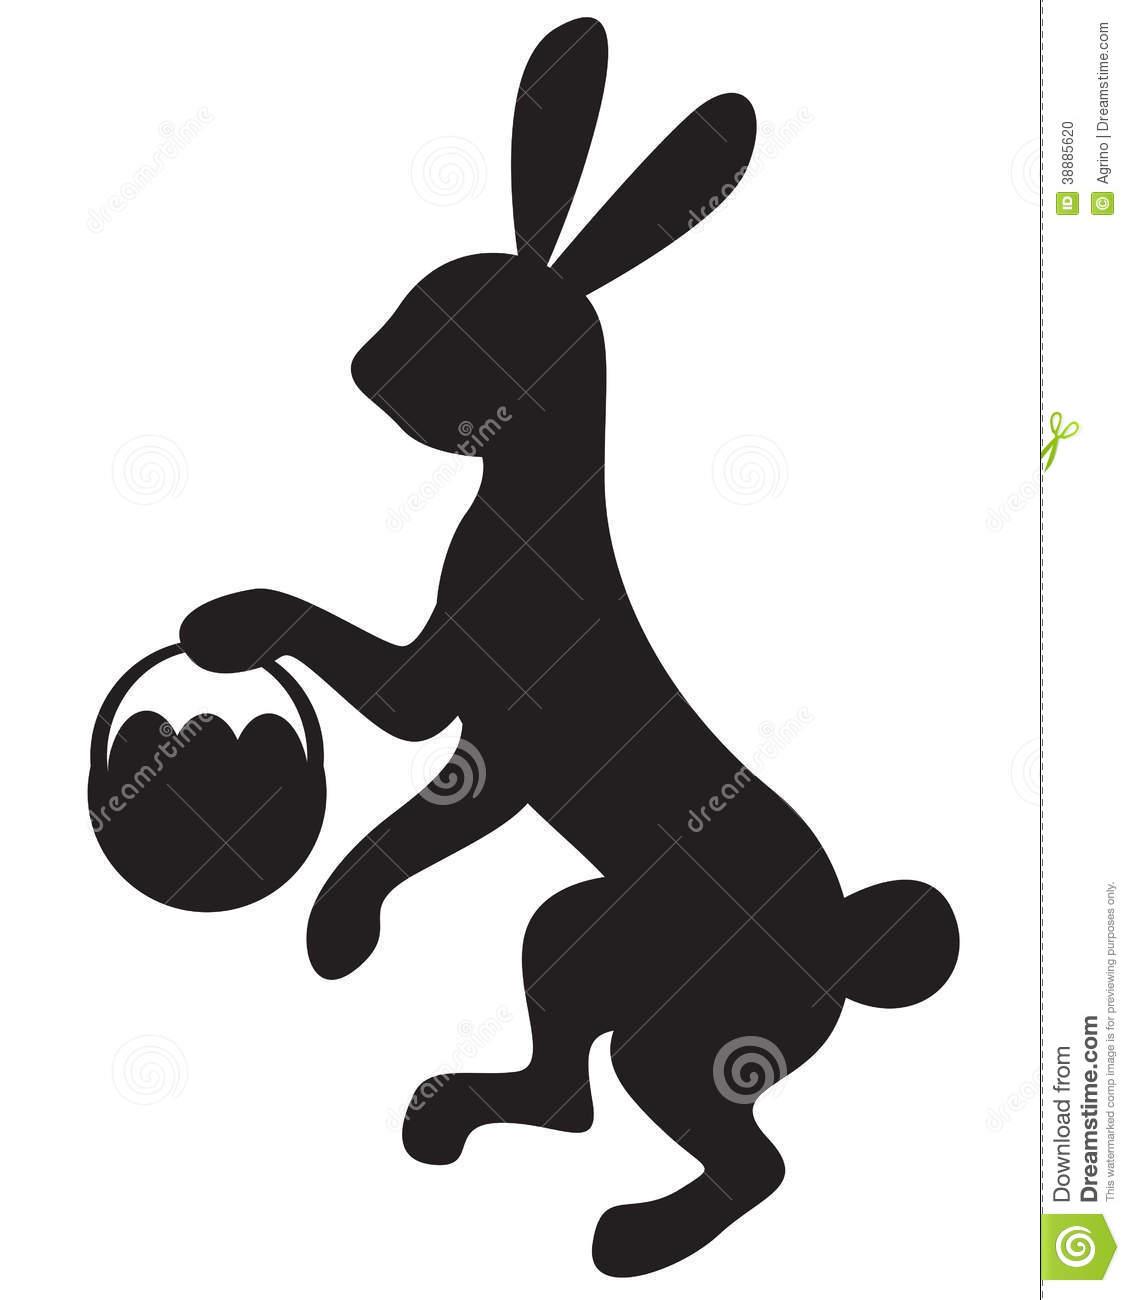 Easter basket silhouette clipart clip art freeuse stock Silhouette Easter Photo Album - Wedding Goods clip art freeuse stock